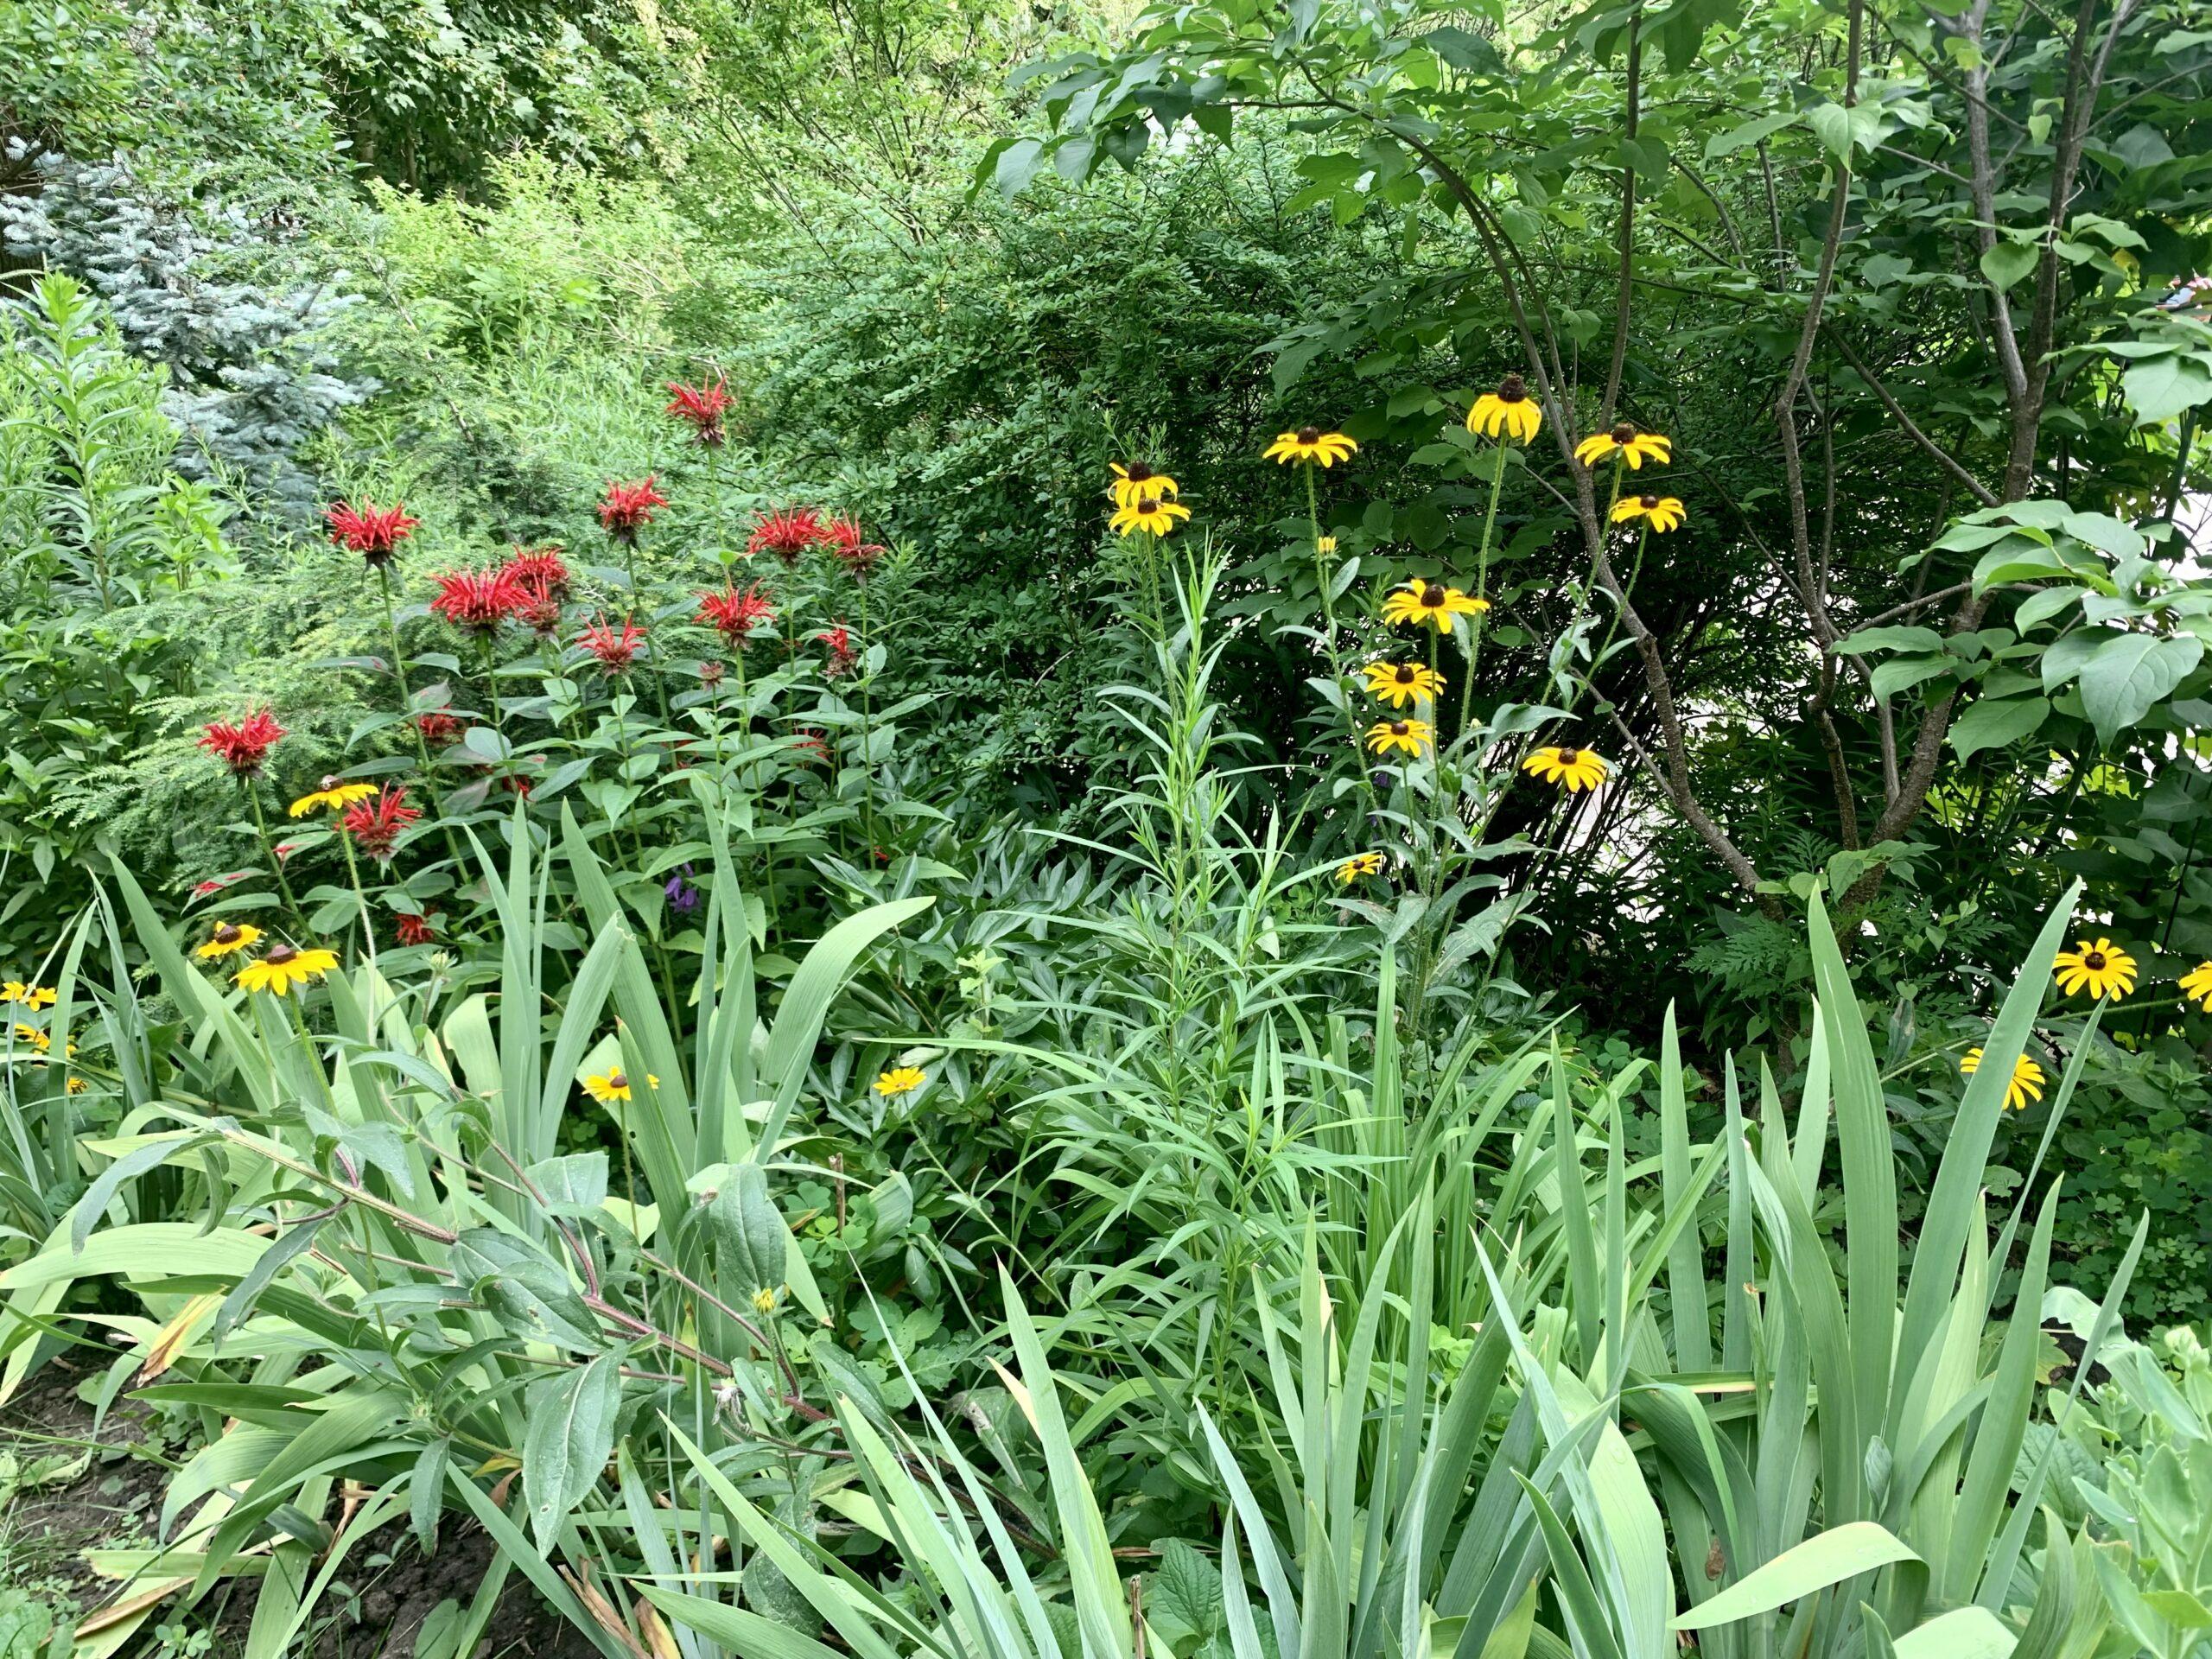 mix of shrubs and perennials